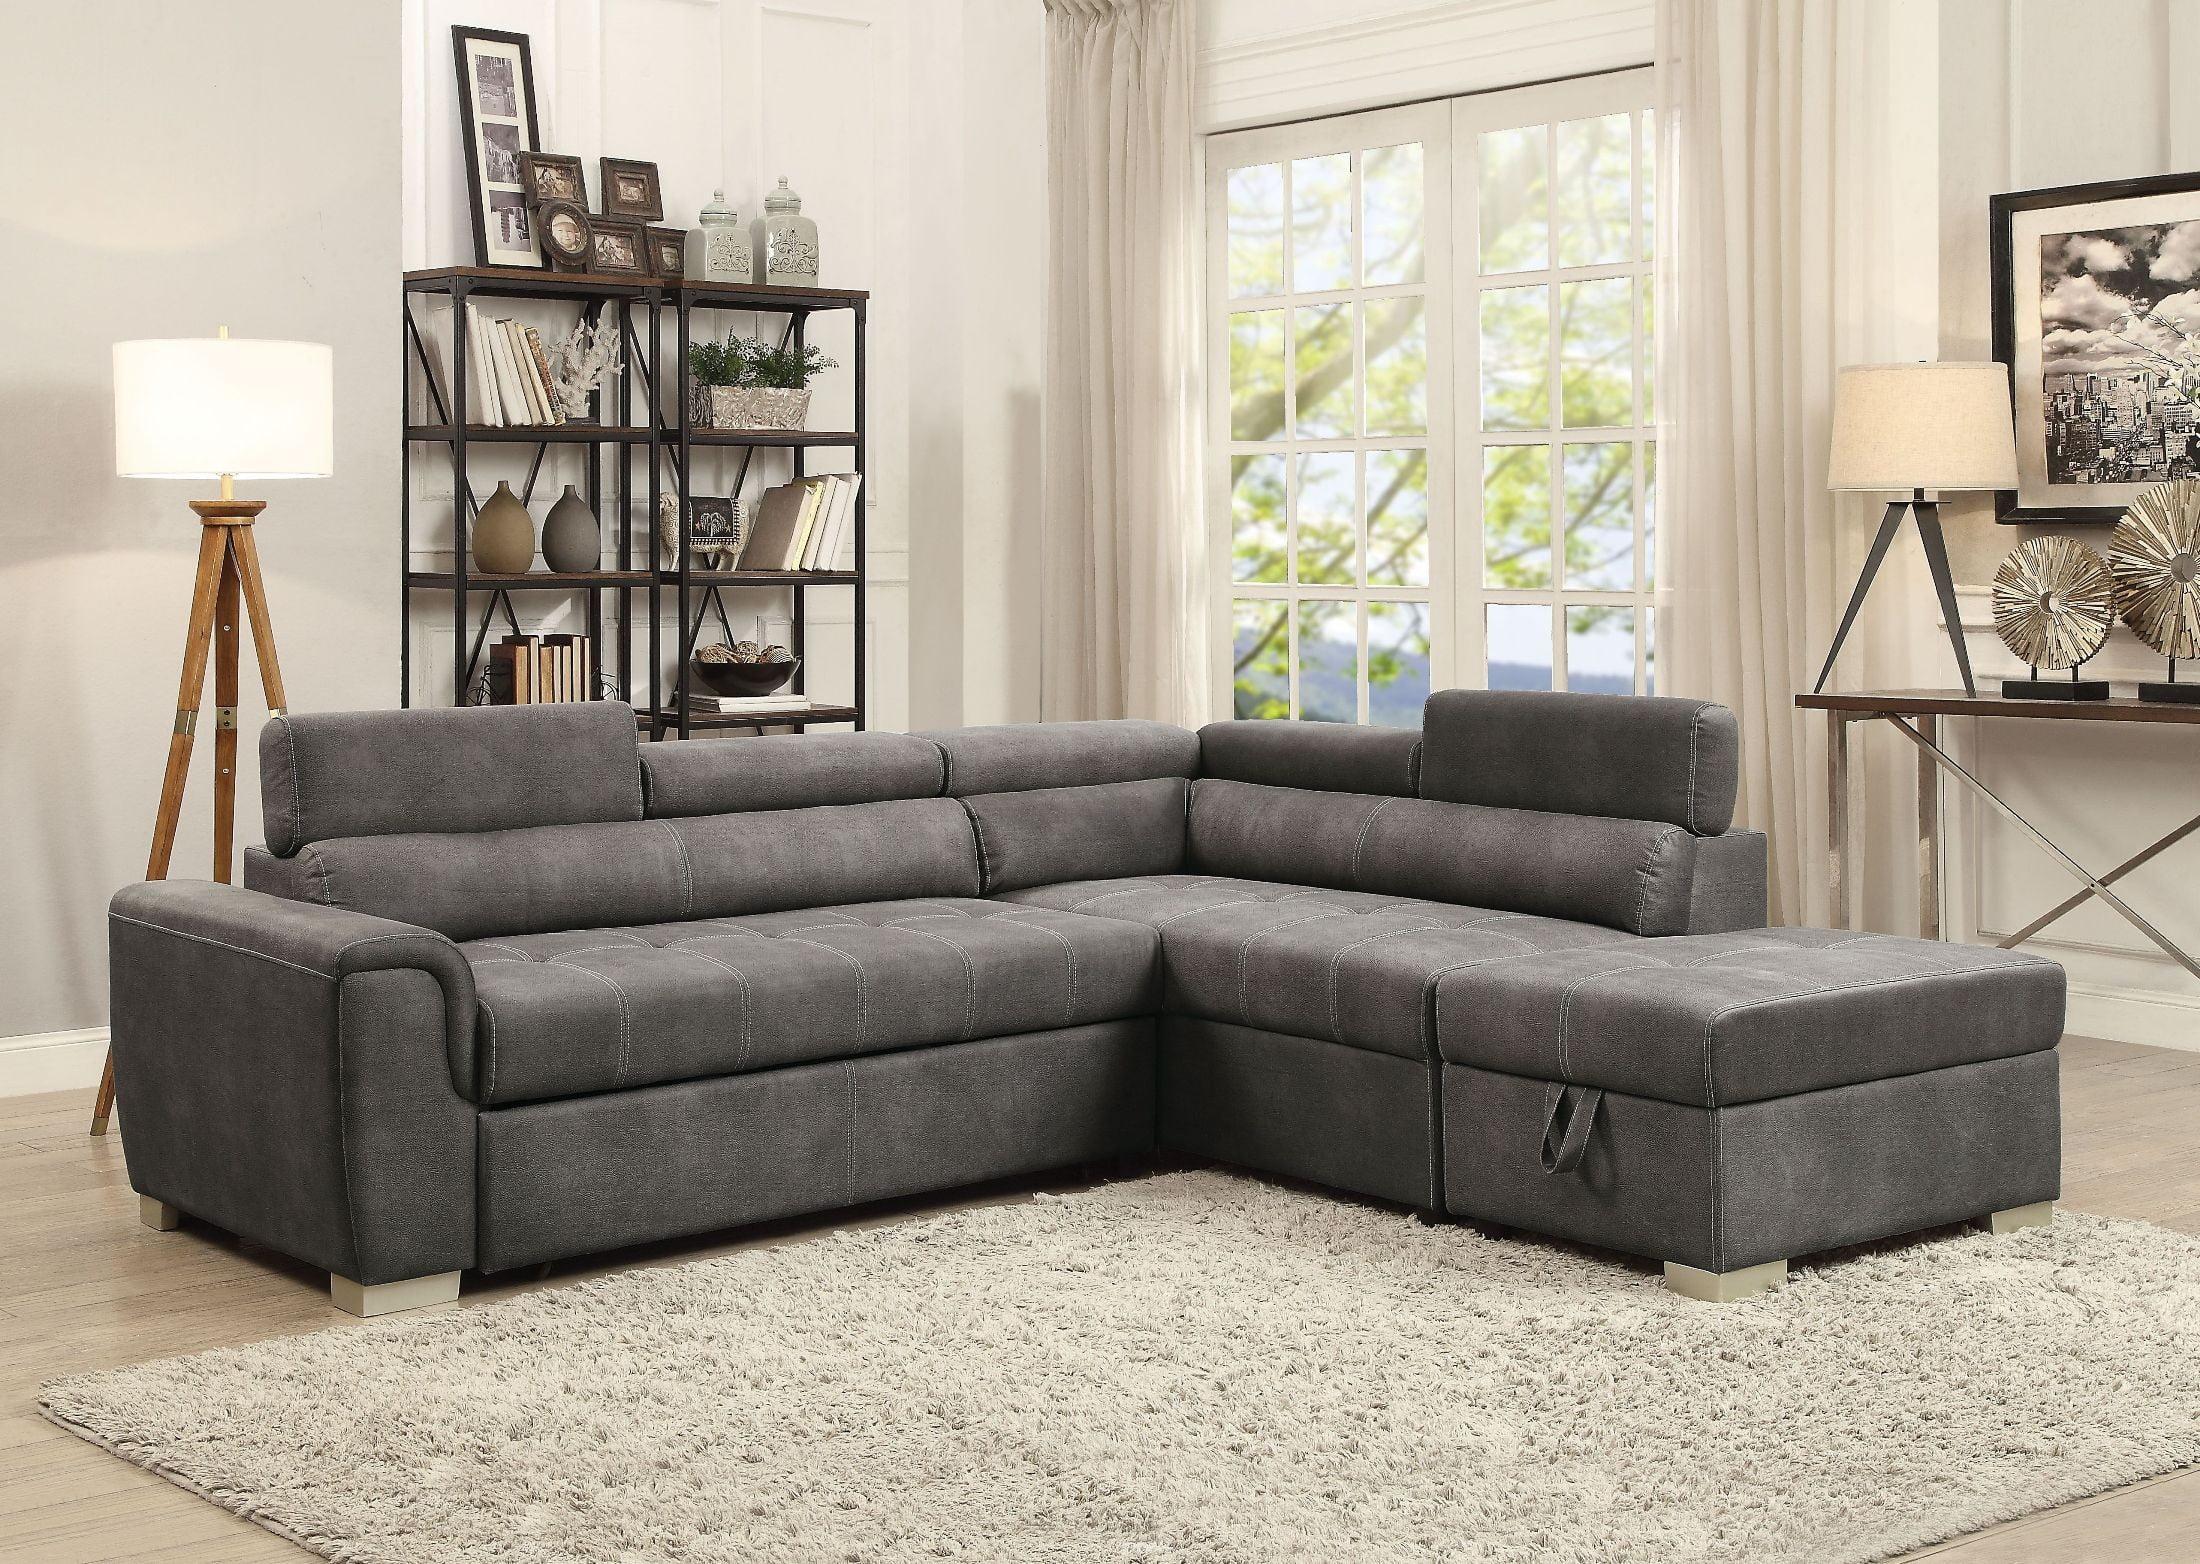 thelma gray polished sectional sleeper sofa with ottoman KXZTTDU